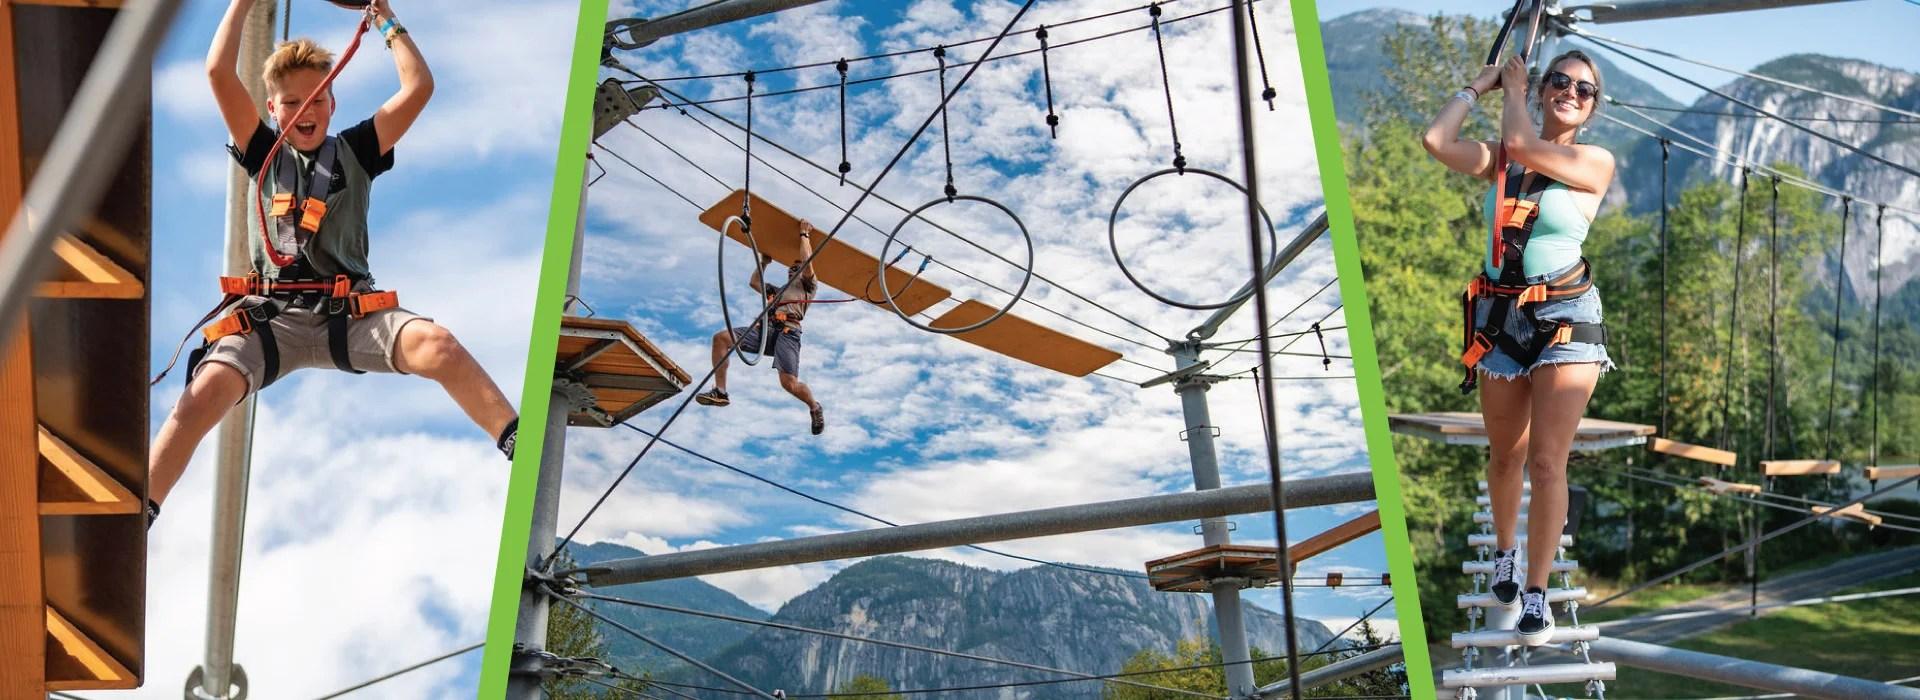 rope runner aerial adventure park squamish banner